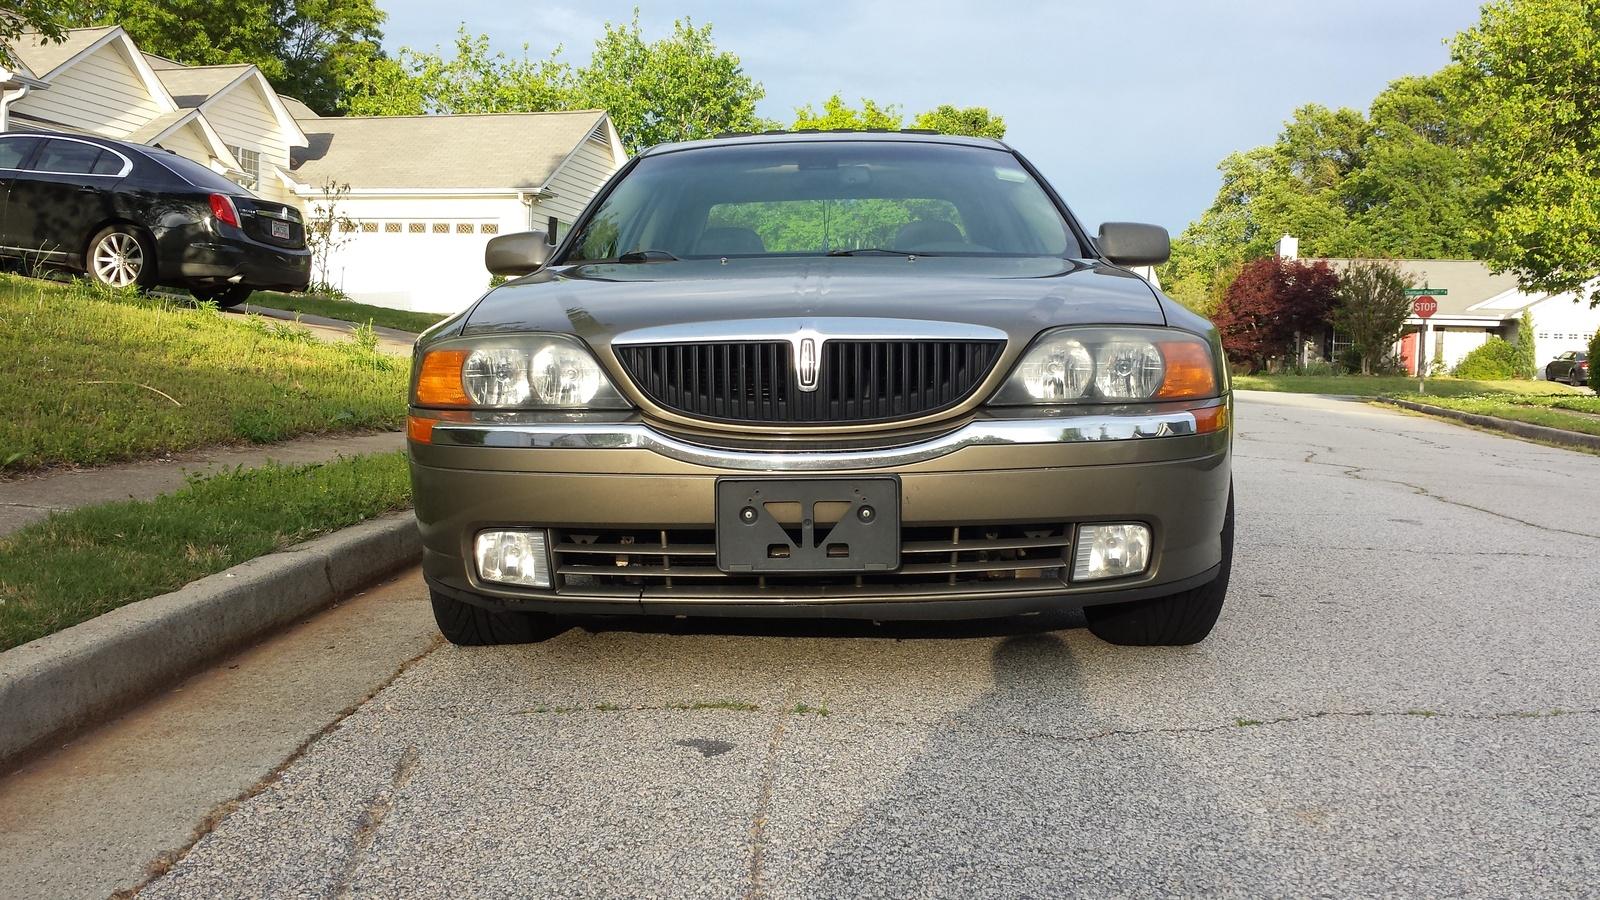 Lincoln Ls V Pic on 2002 Lincoln Ls V8 Lse